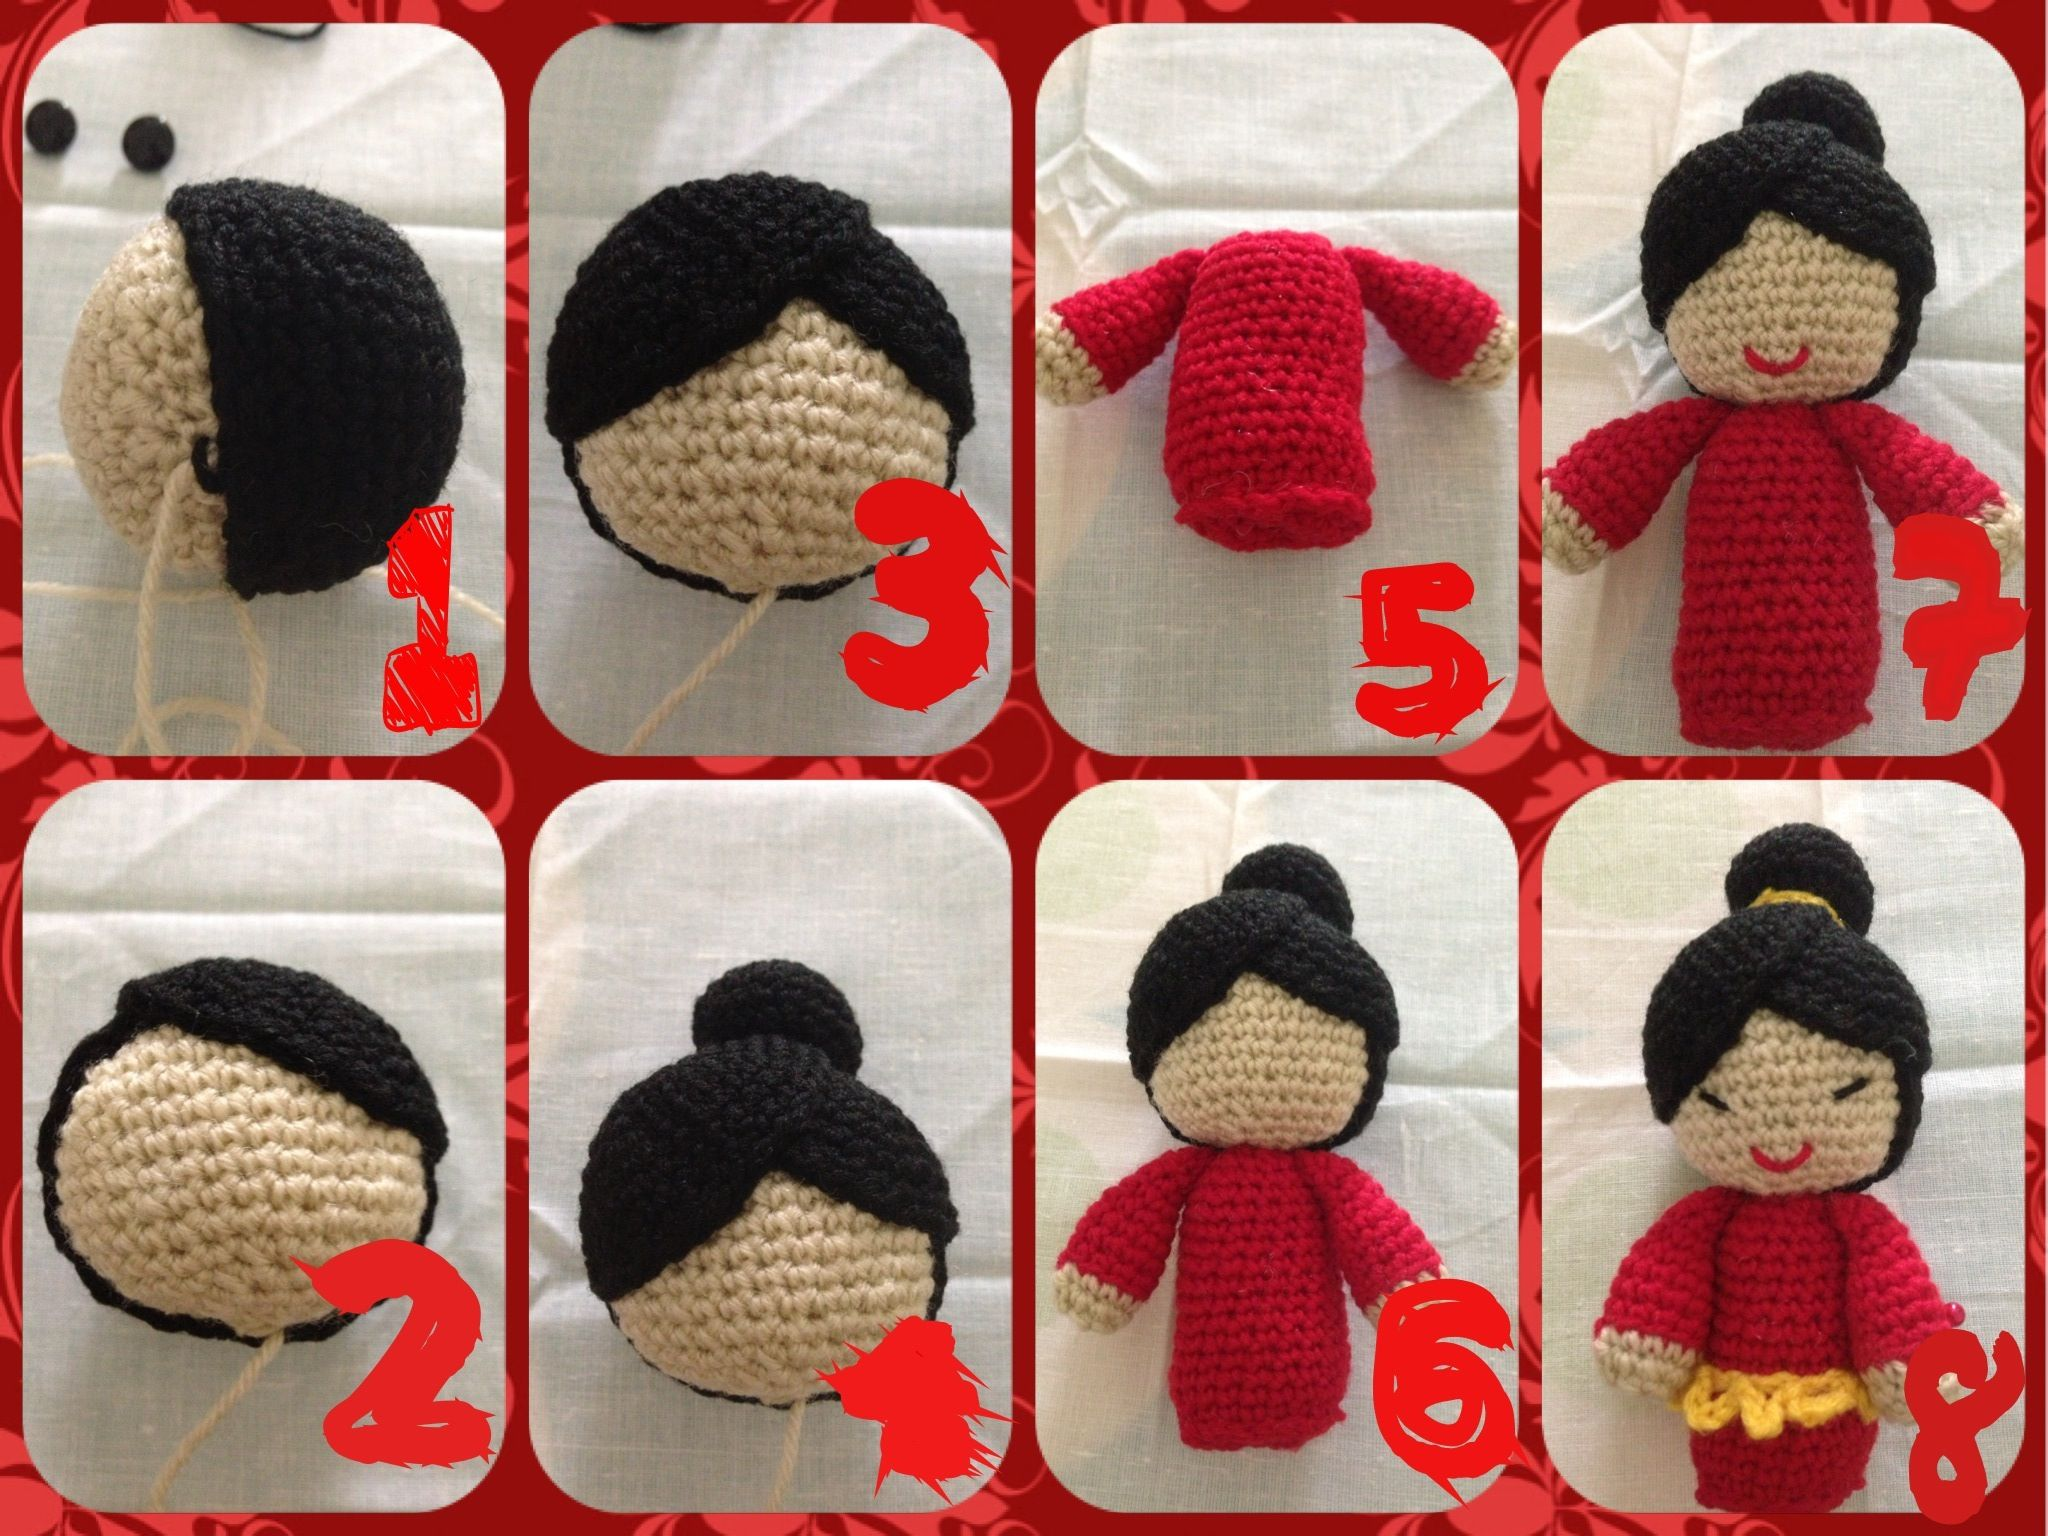 Crochet Amigurumi Doll Free : Free crochet amigurumi doll pattern a basic crochet doll pattern